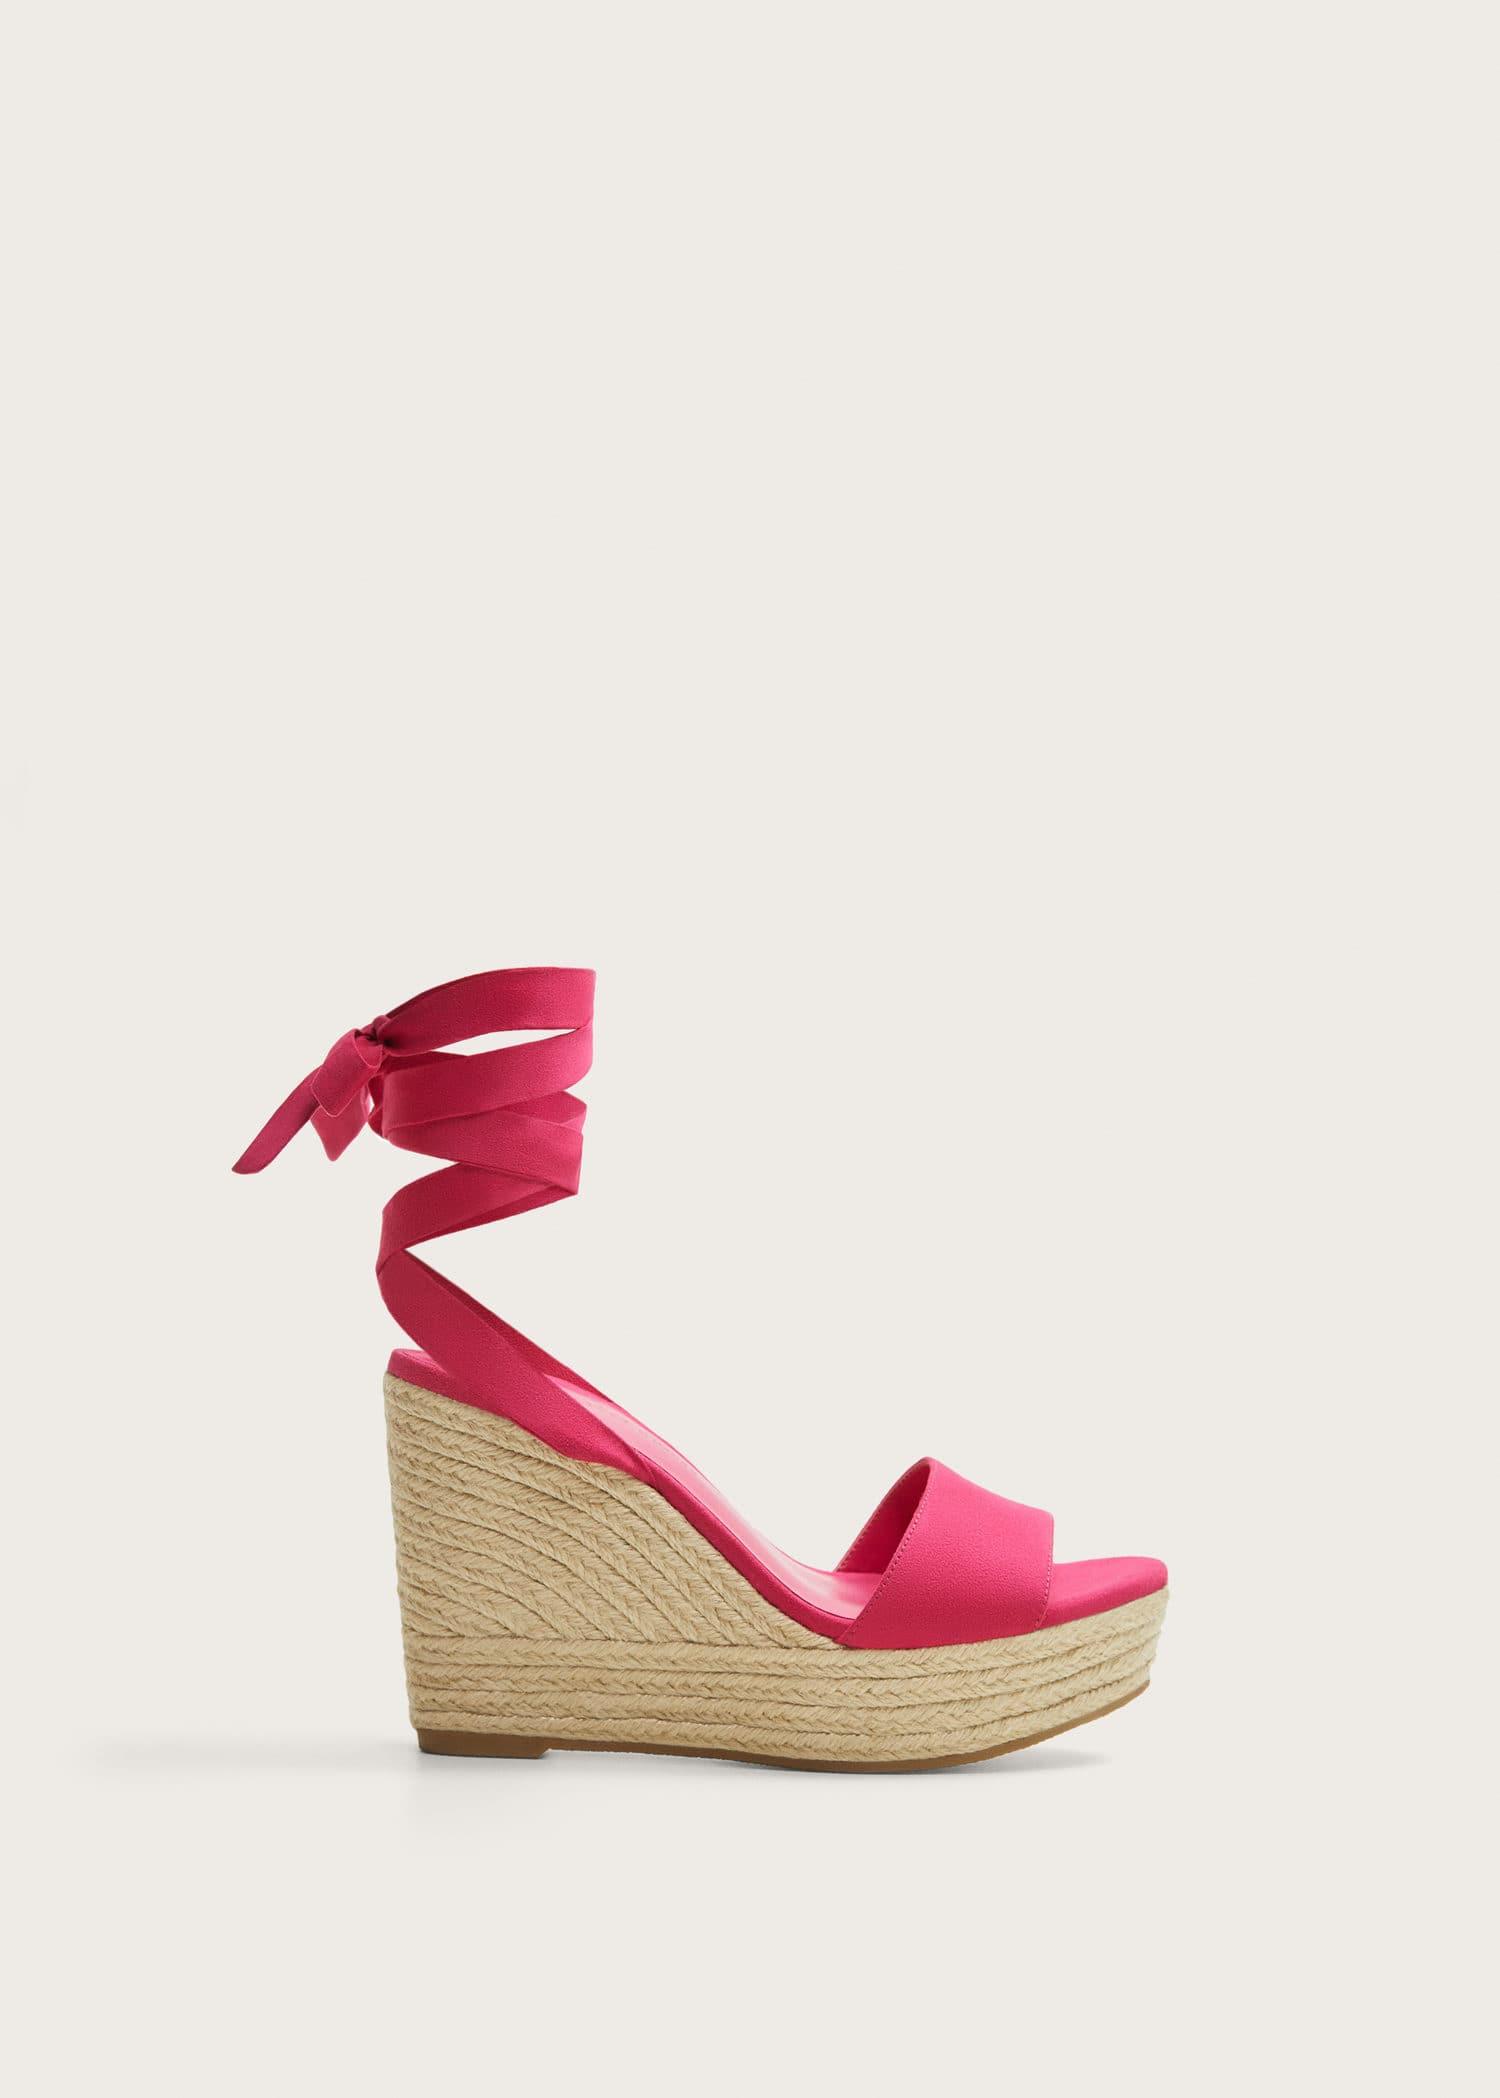 Zapatos Mango Tacón By Sandalias Tallas 2019Violeta Grandes qMVGUSLpz